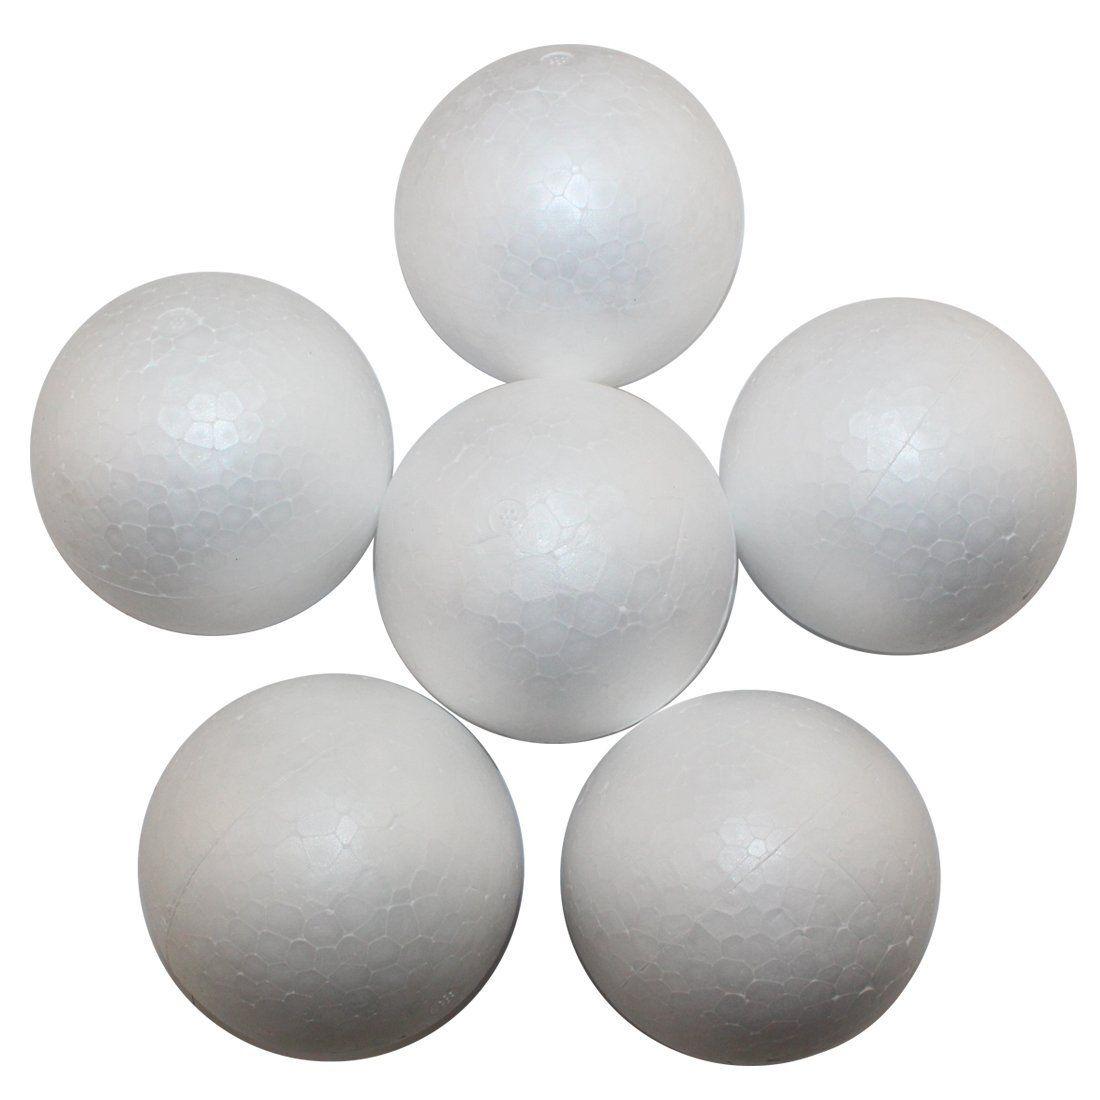 Foam ball craft - Decora 3 9 Inch Natural White Styrofoam Round Balls Craft Ball Foam Ball Diy Handmade Painted Ball